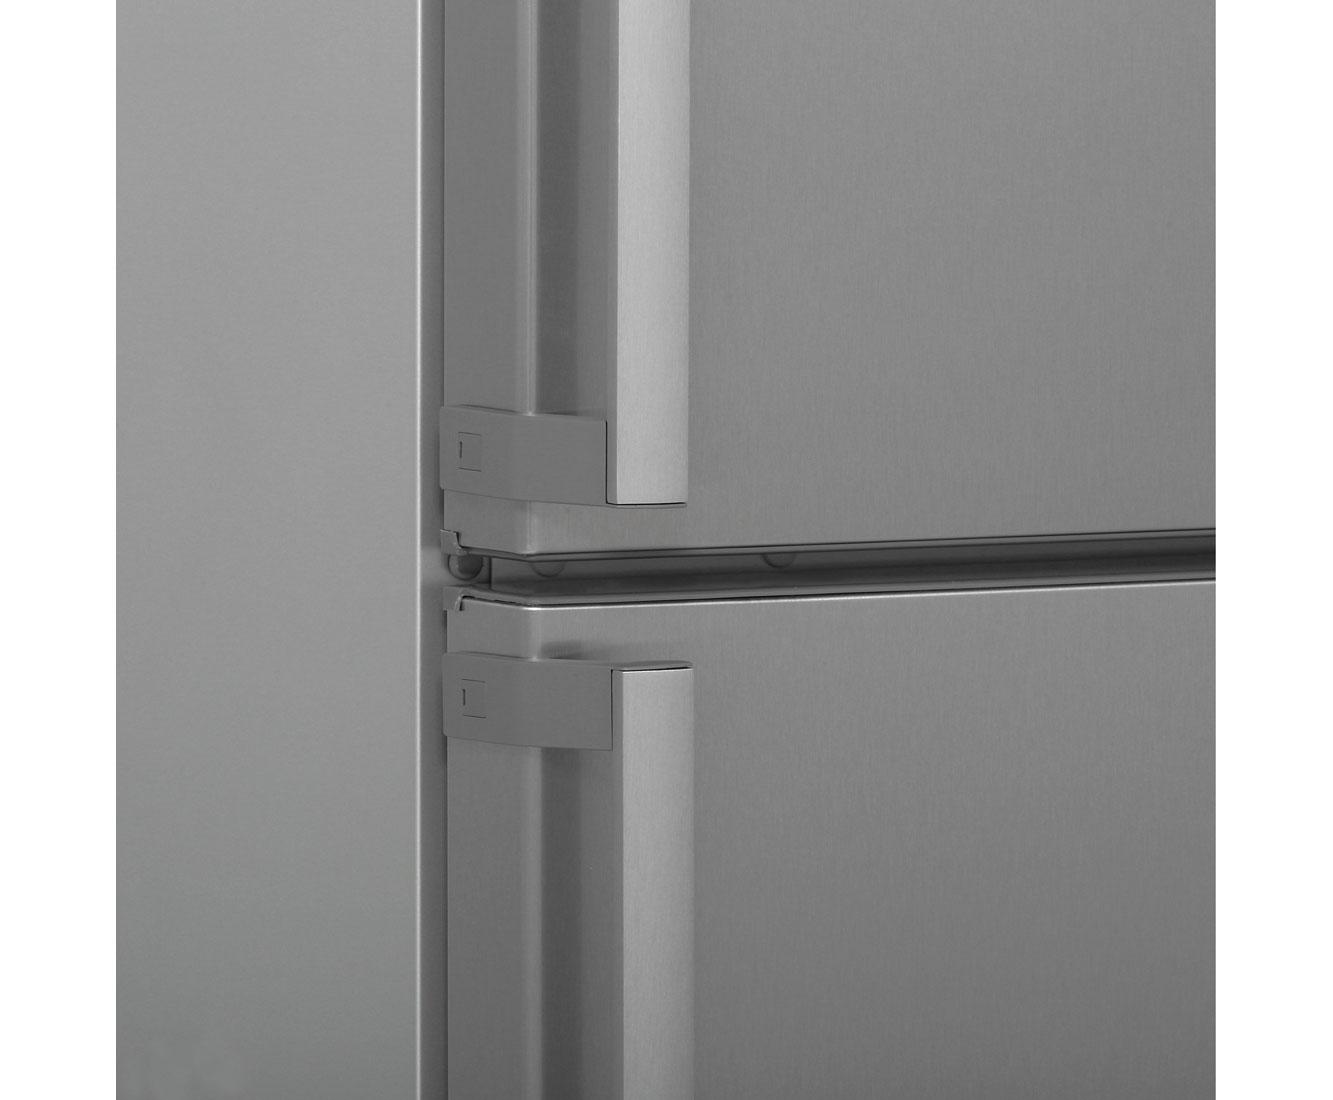 Bosch Kühlschrank Kge39ai40 : Bosch serie kge ai kühl gefrierkombination er breite